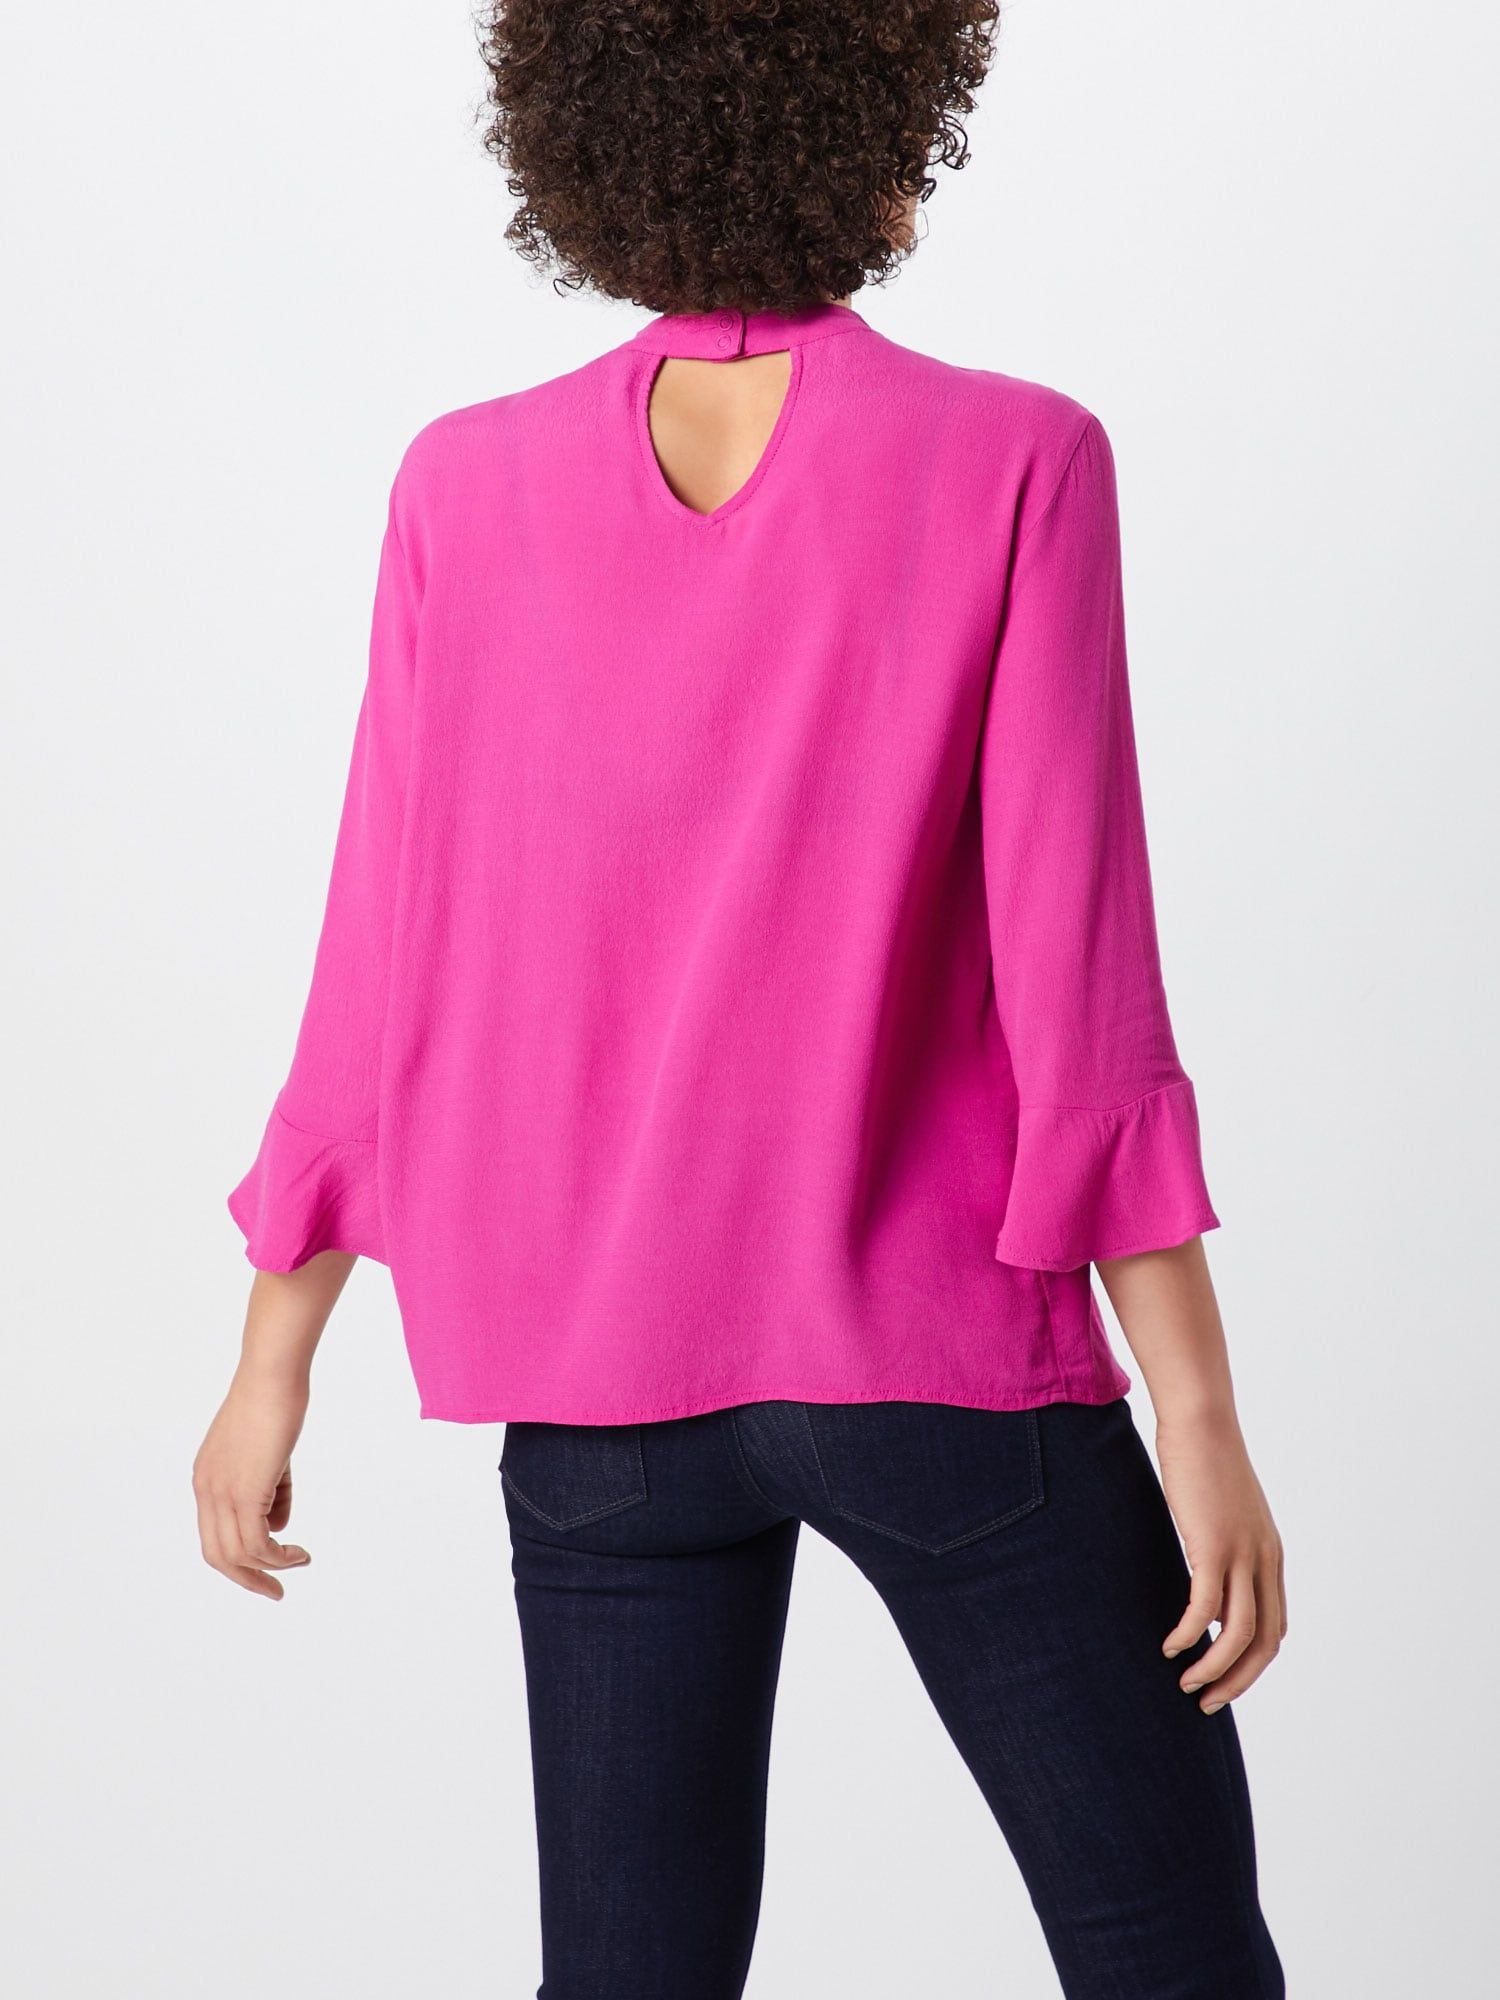 TOM TAILOR DENIM Bluse 'choker neck tunic' Damen, Fuchsia, Größe XS #tunicdesigns